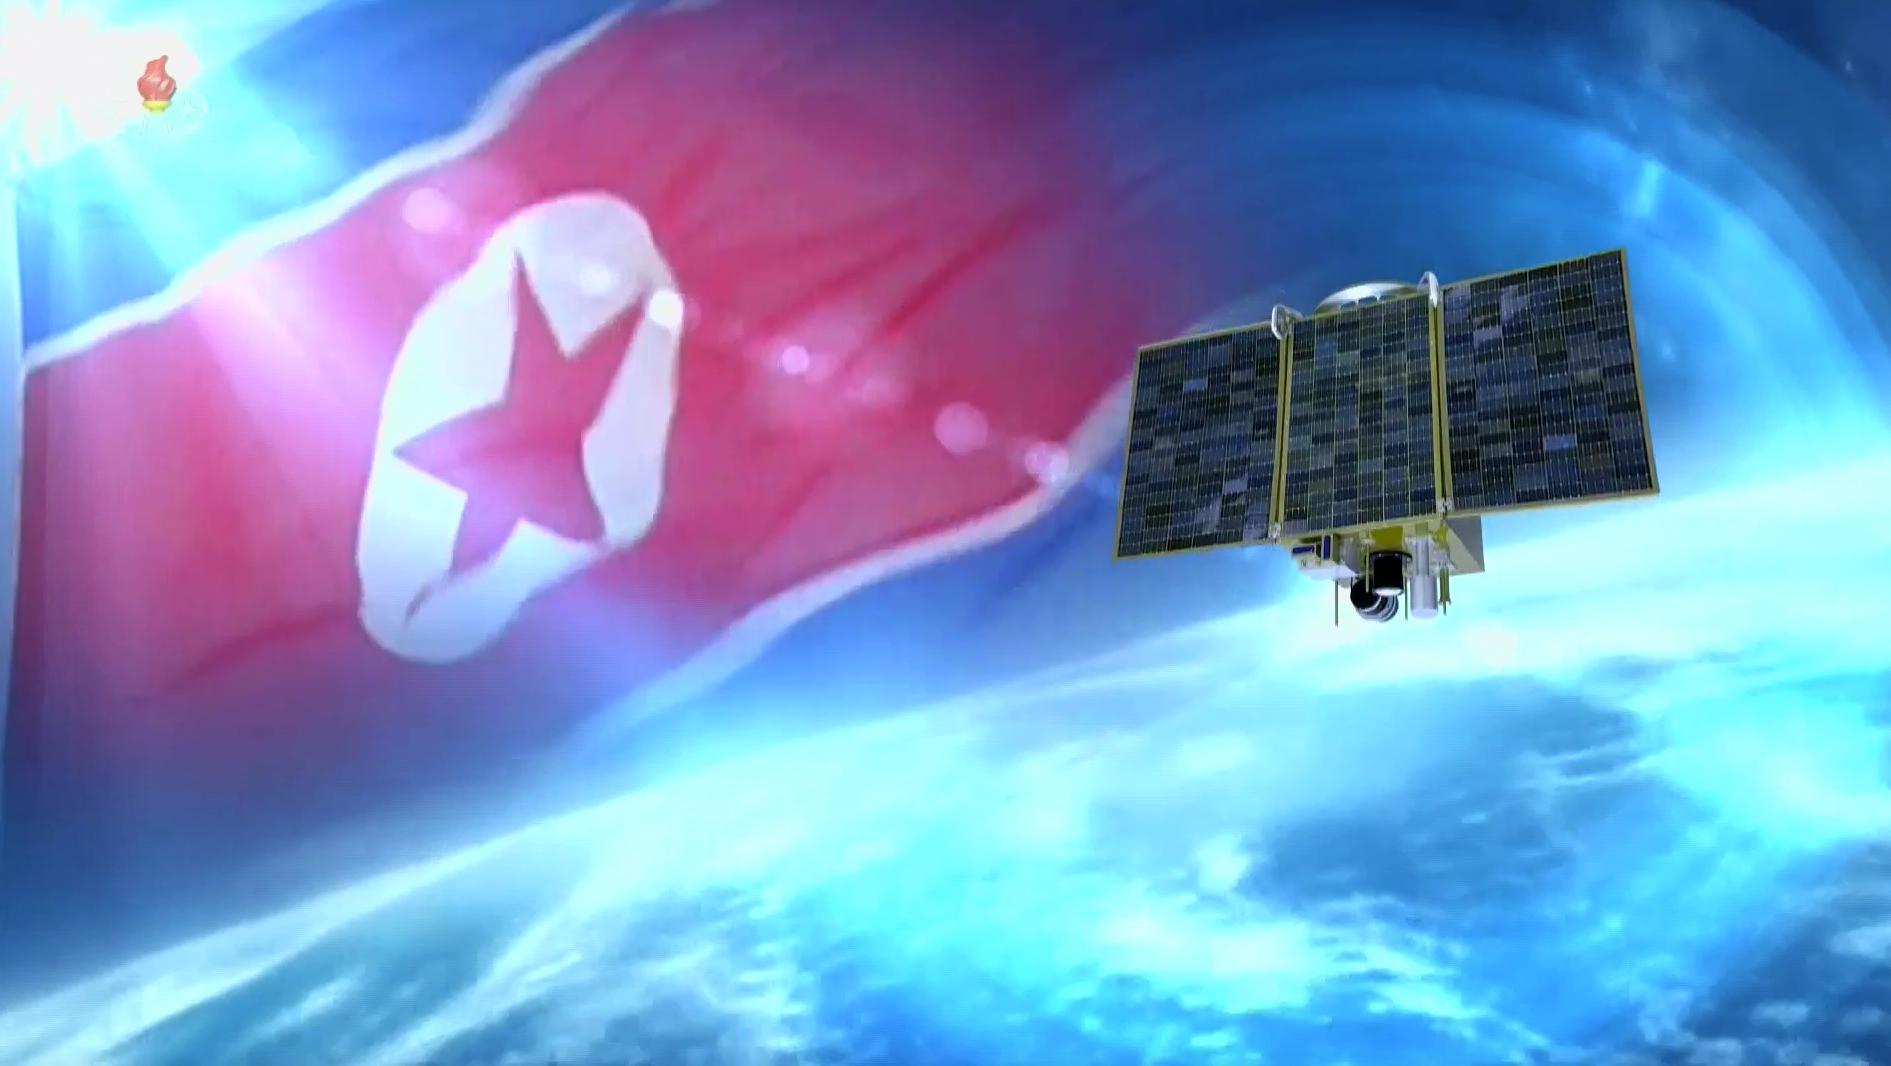 North Korea making strides in satellite manufacturing and testing: state media